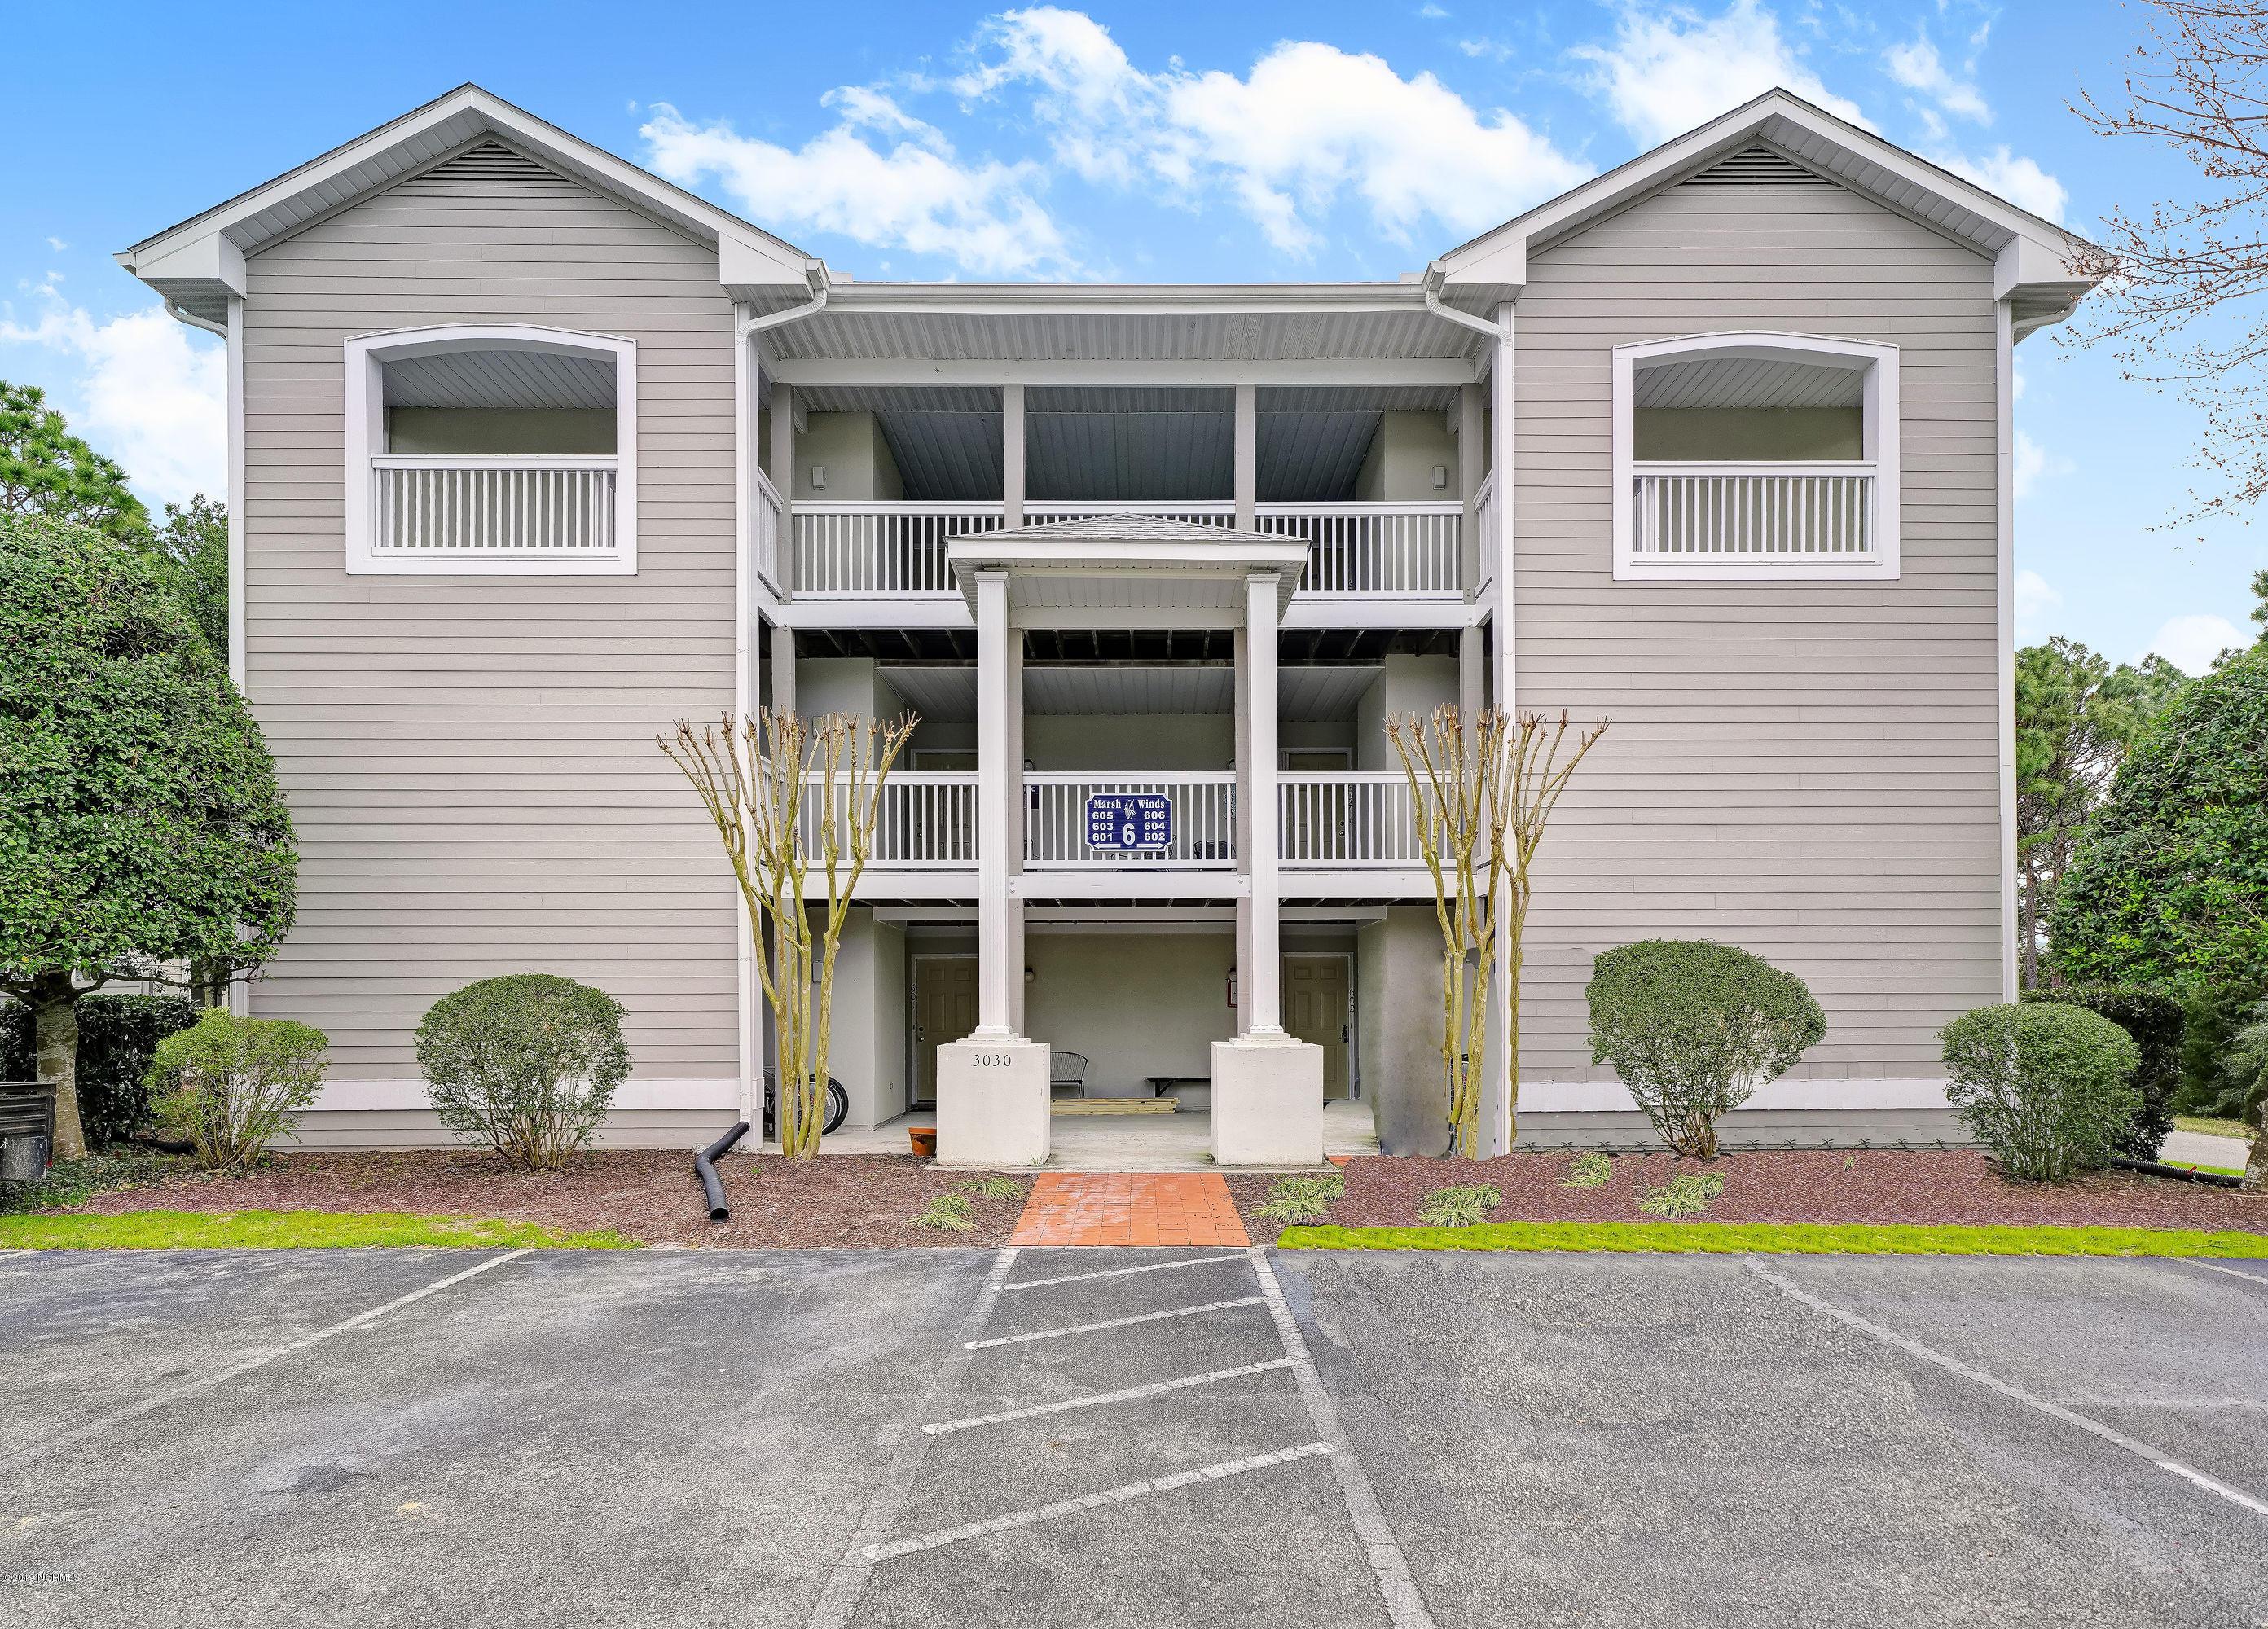 Carolina Plantations Real Estate - MLS Number: 100153397